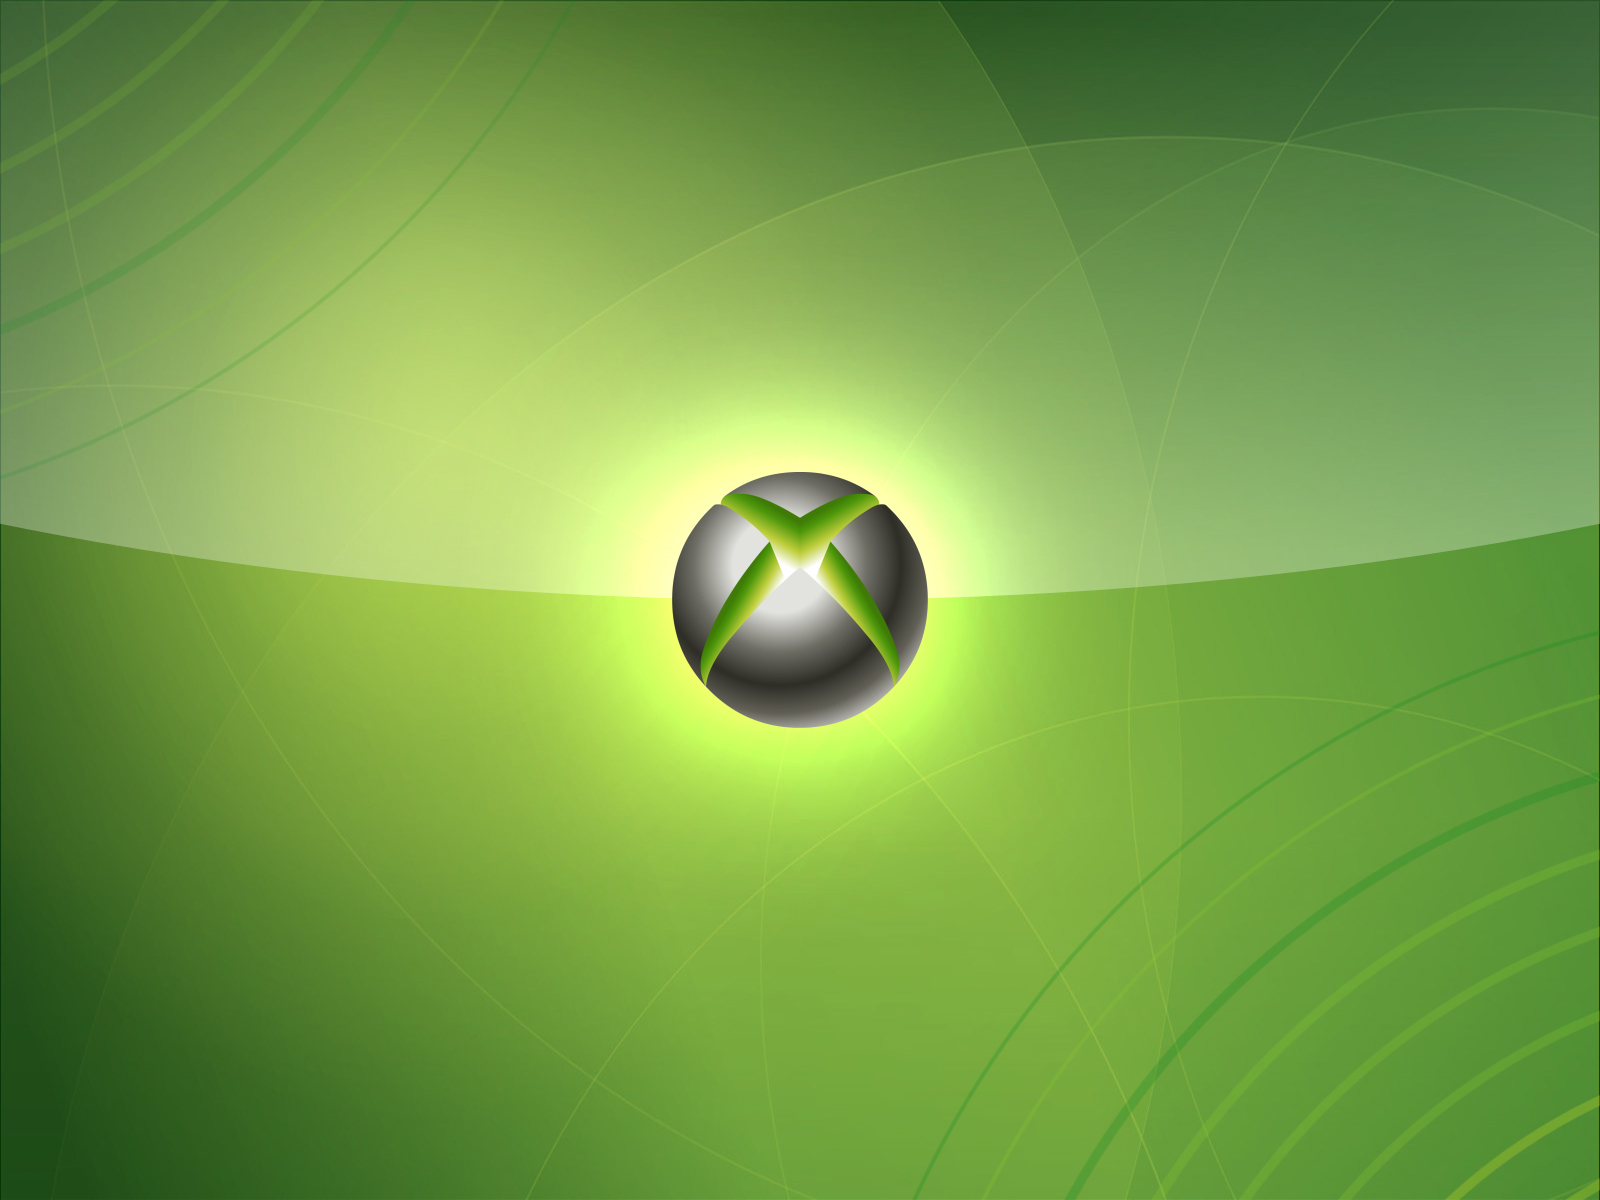 Japan Farewells The Xbox 360